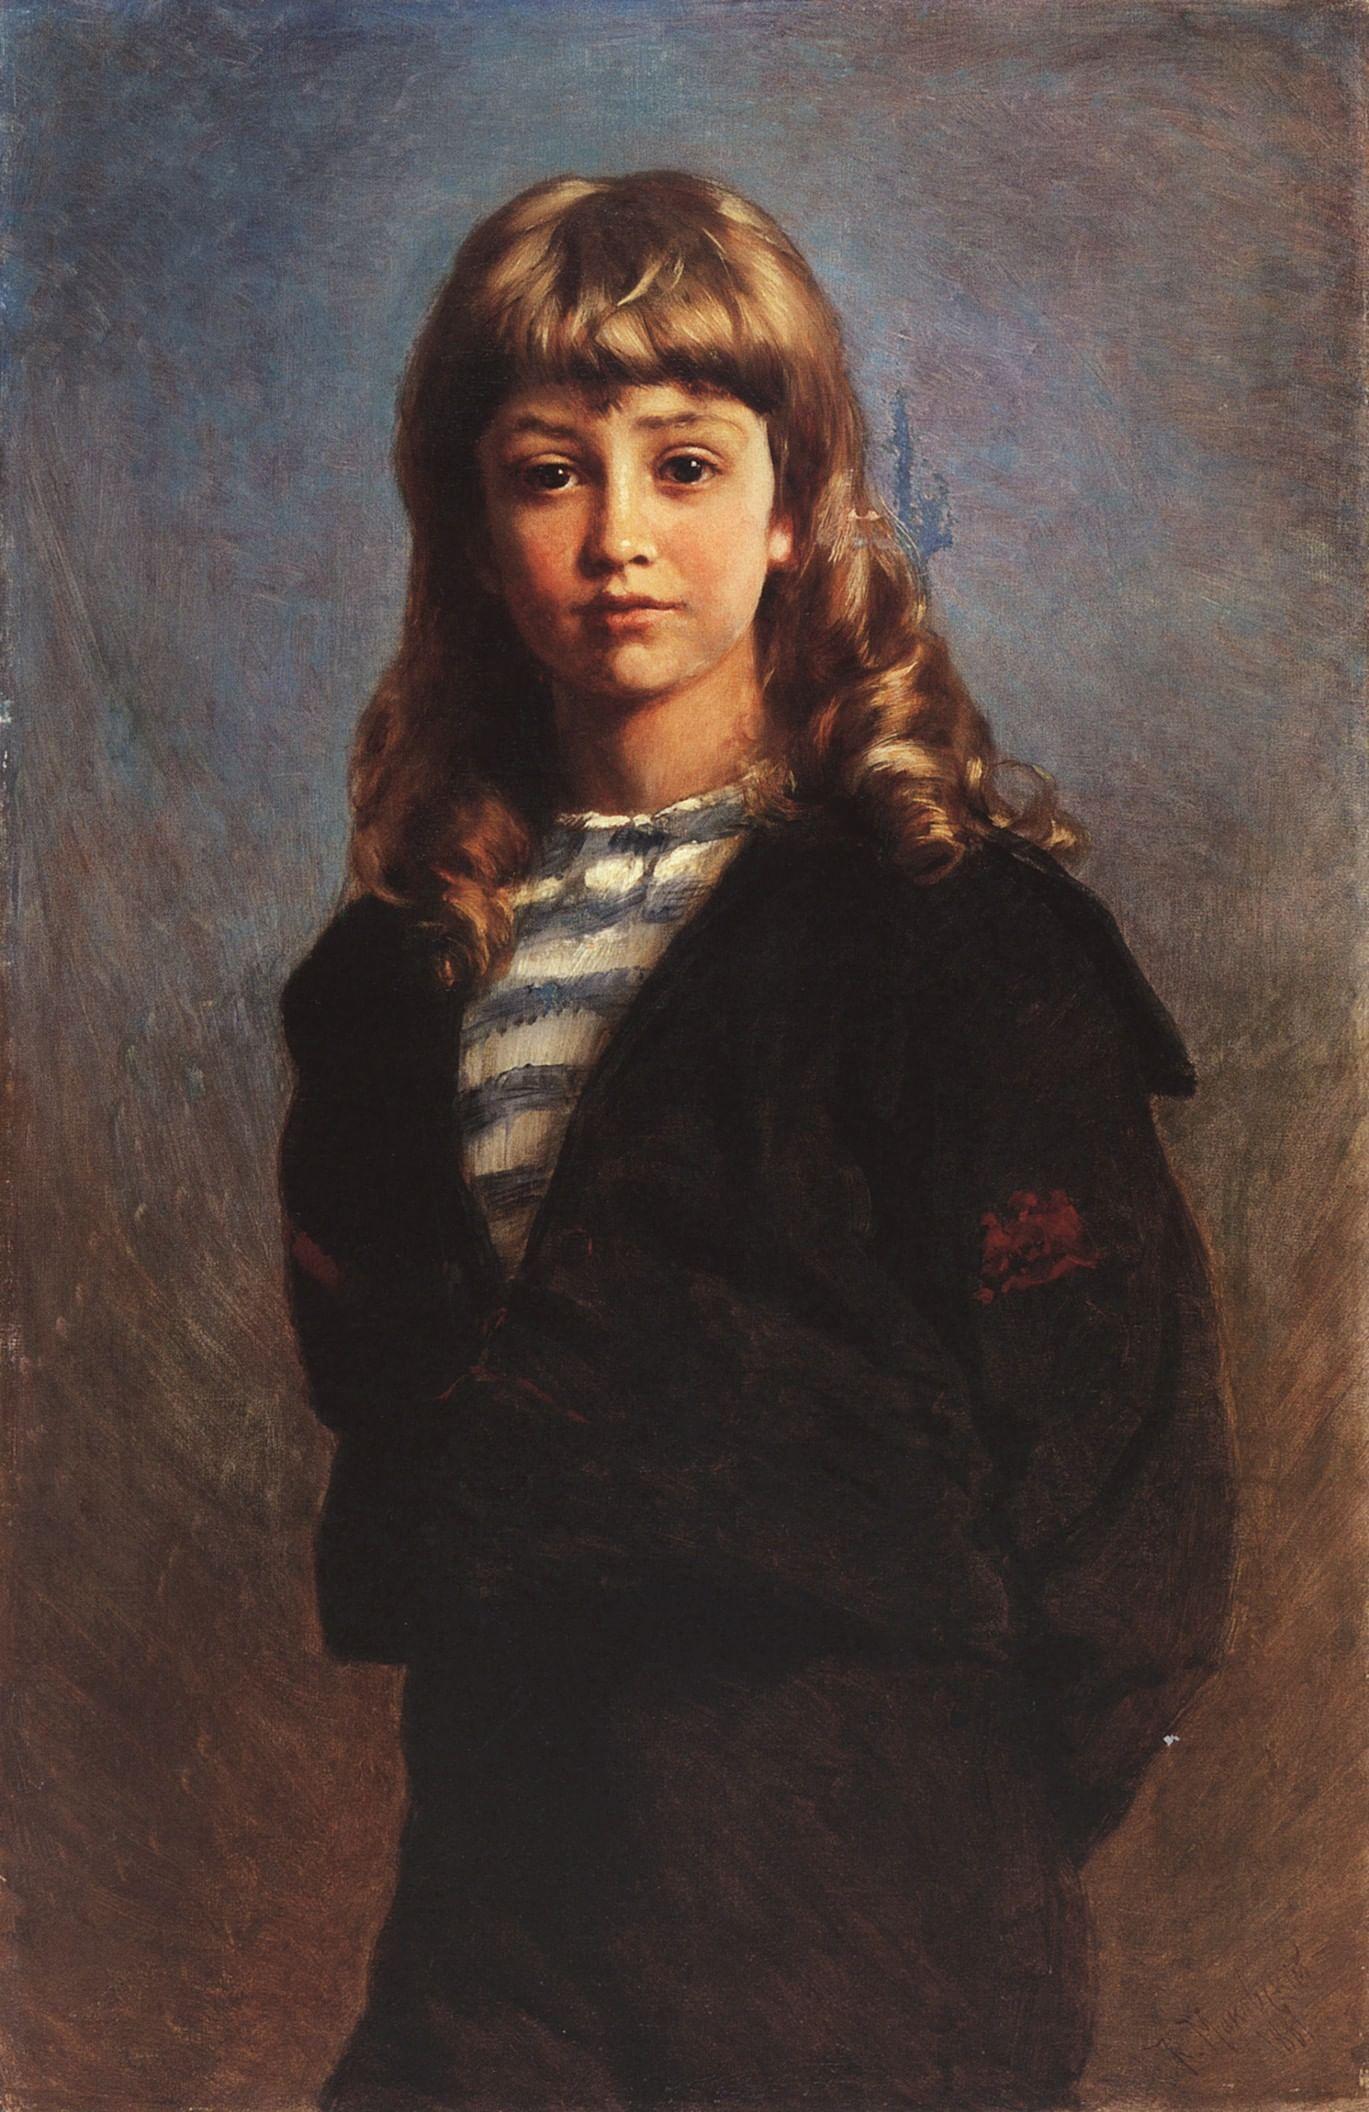 Родители - детям. Галерея 3. Константин Маковский